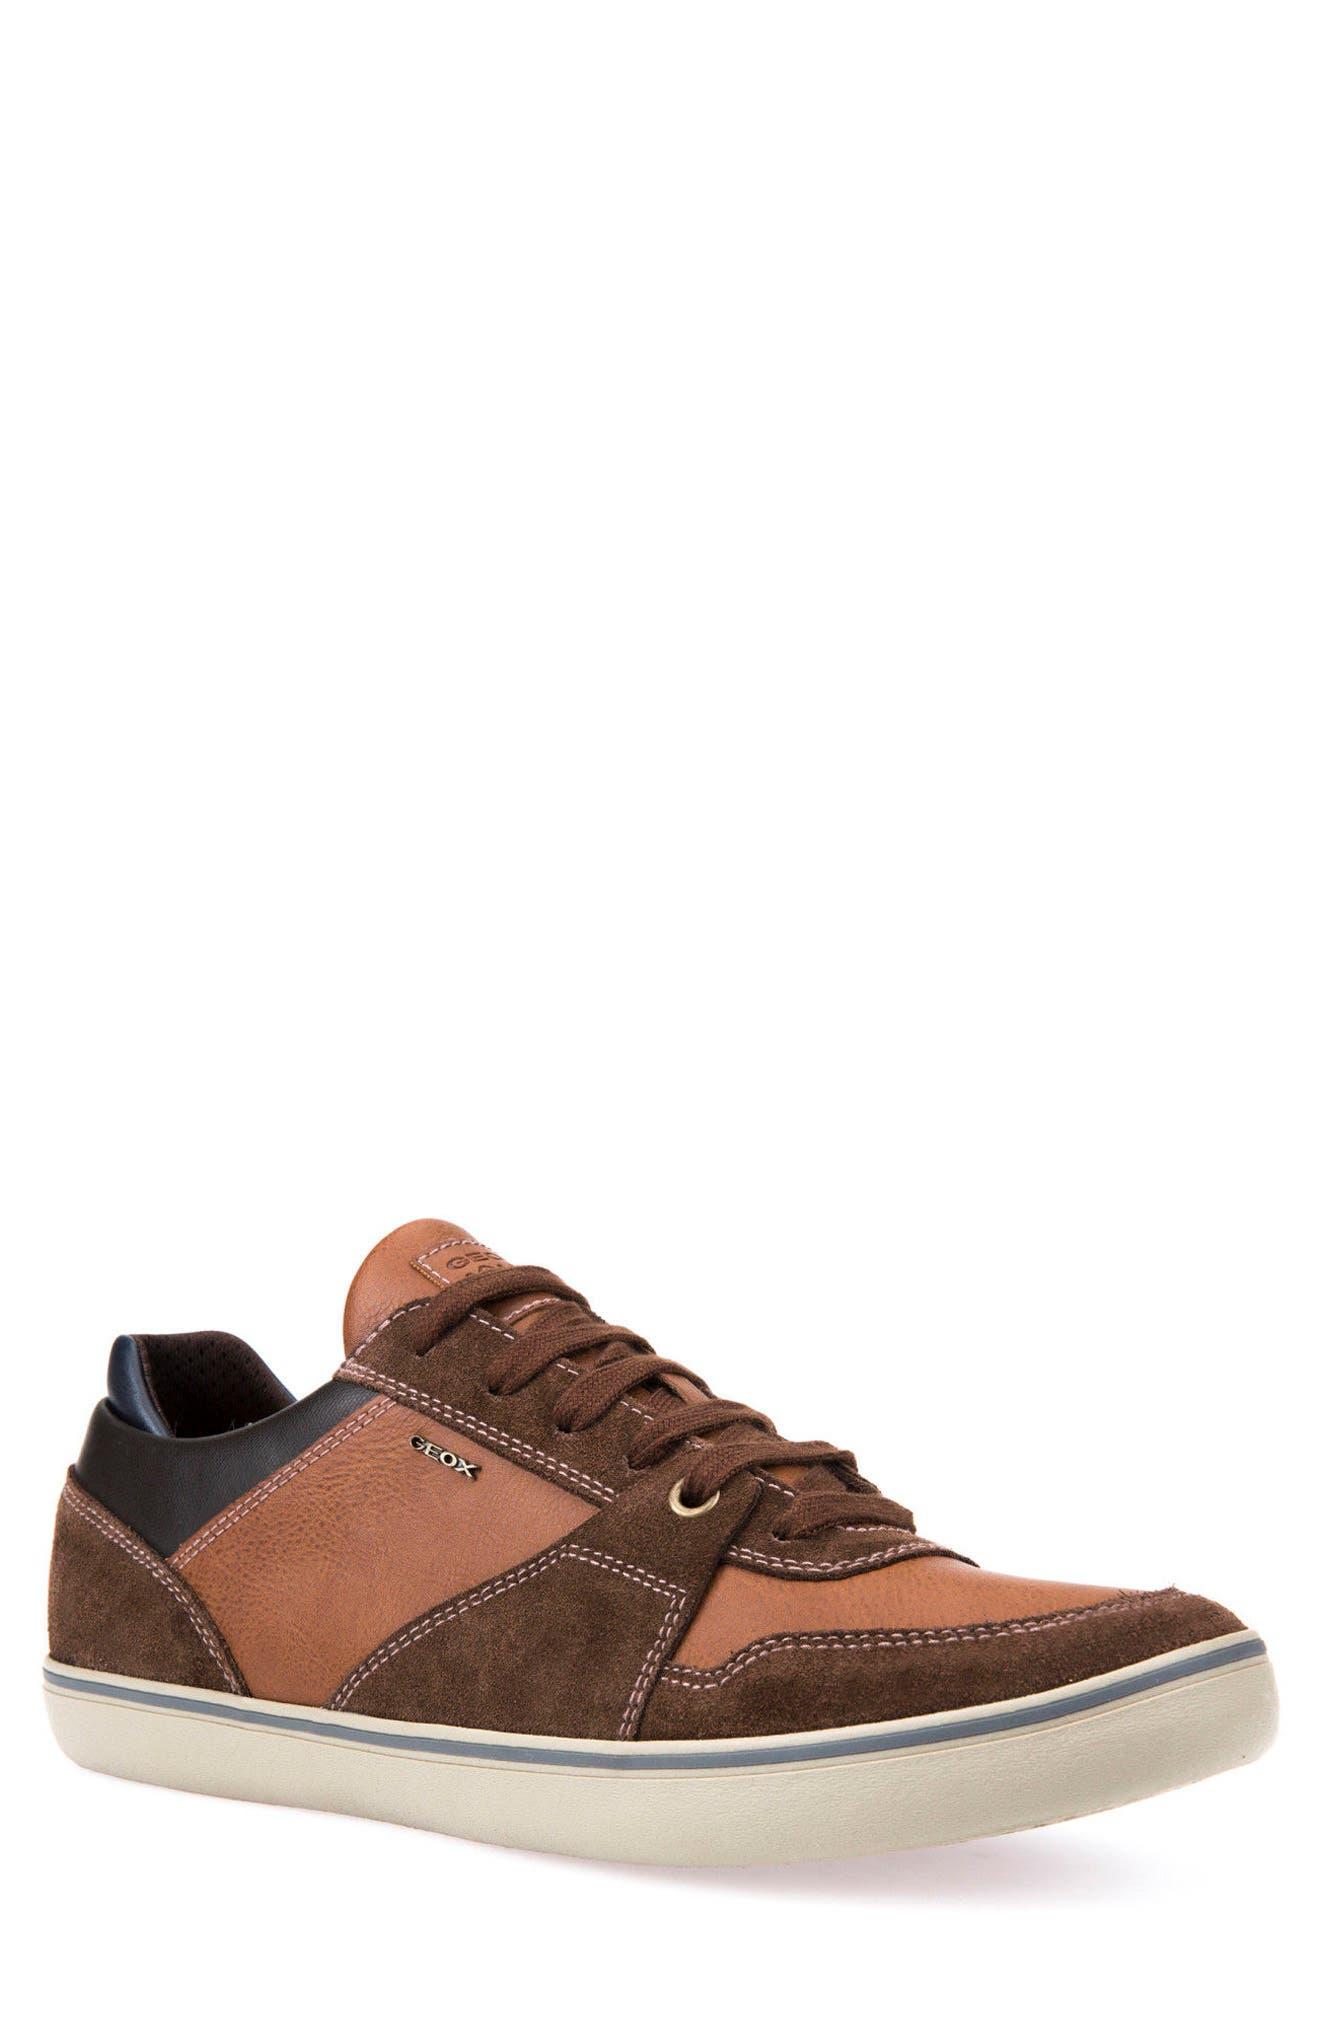 Box 27 Low-Top Sneaker,                         Main,                         color, Ebony/ Brown Cotto